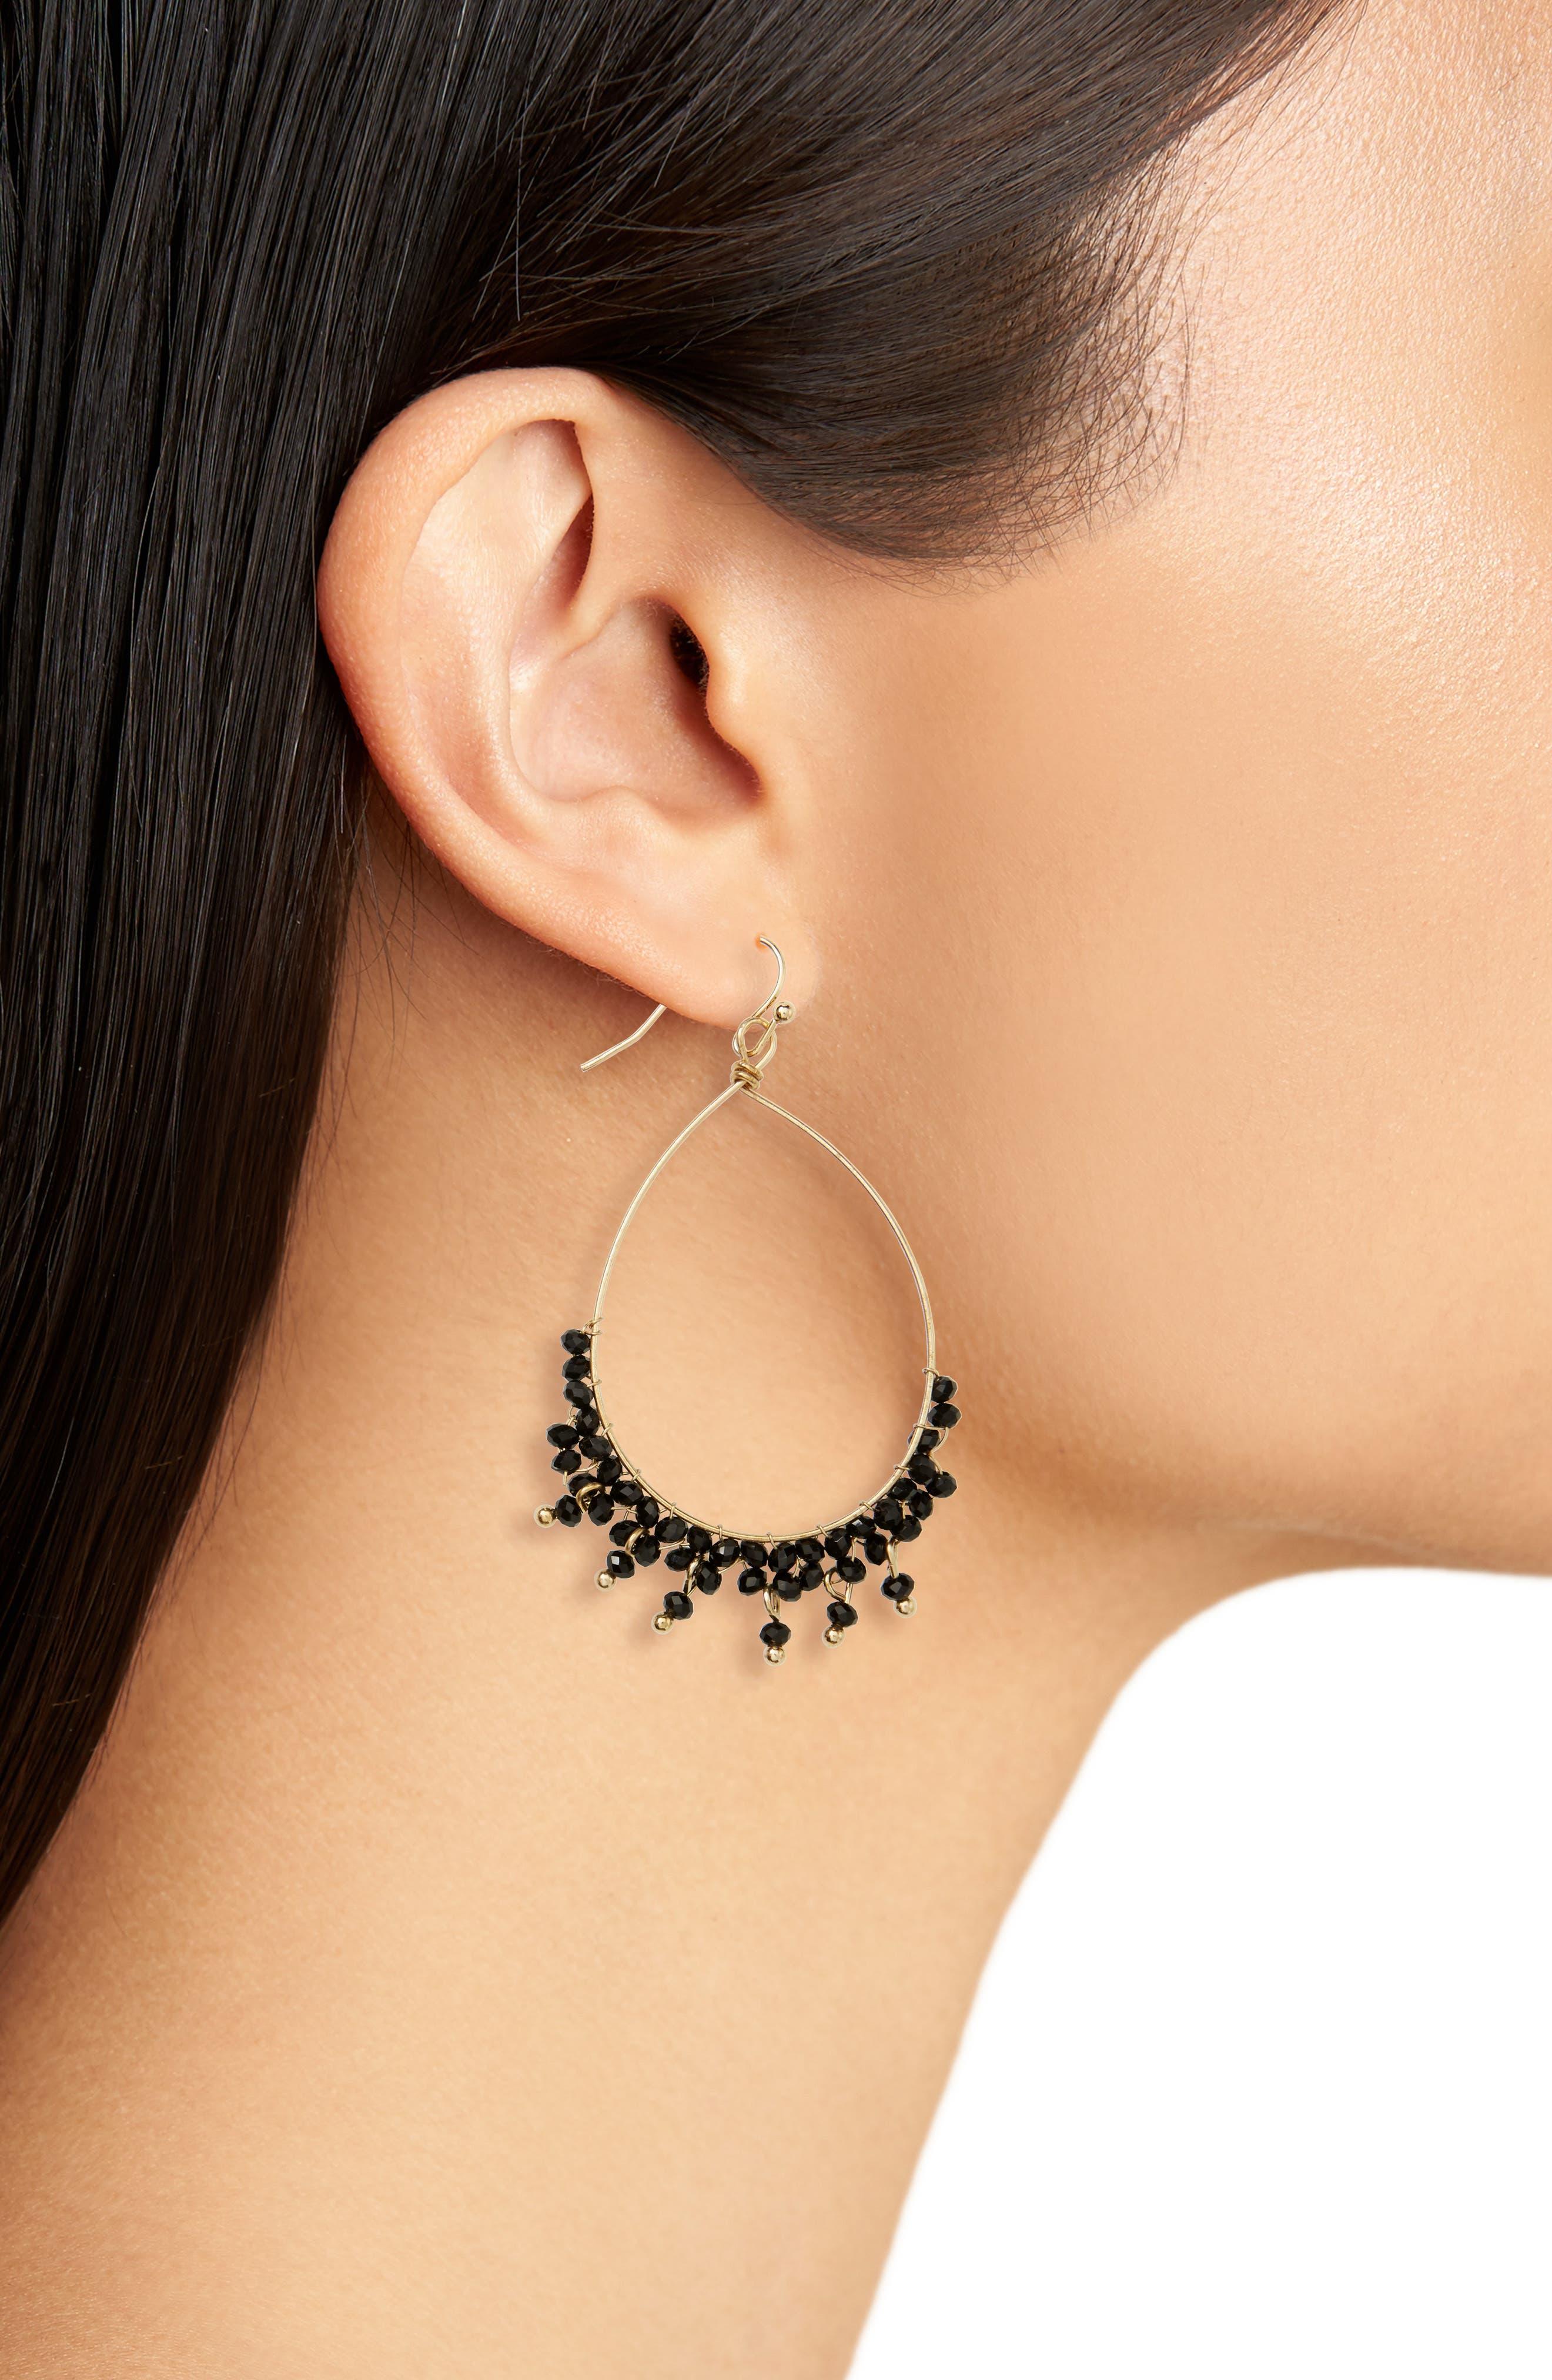 Crystal Teardrop Earrings,                             Alternate thumbnail 2, color,                             710